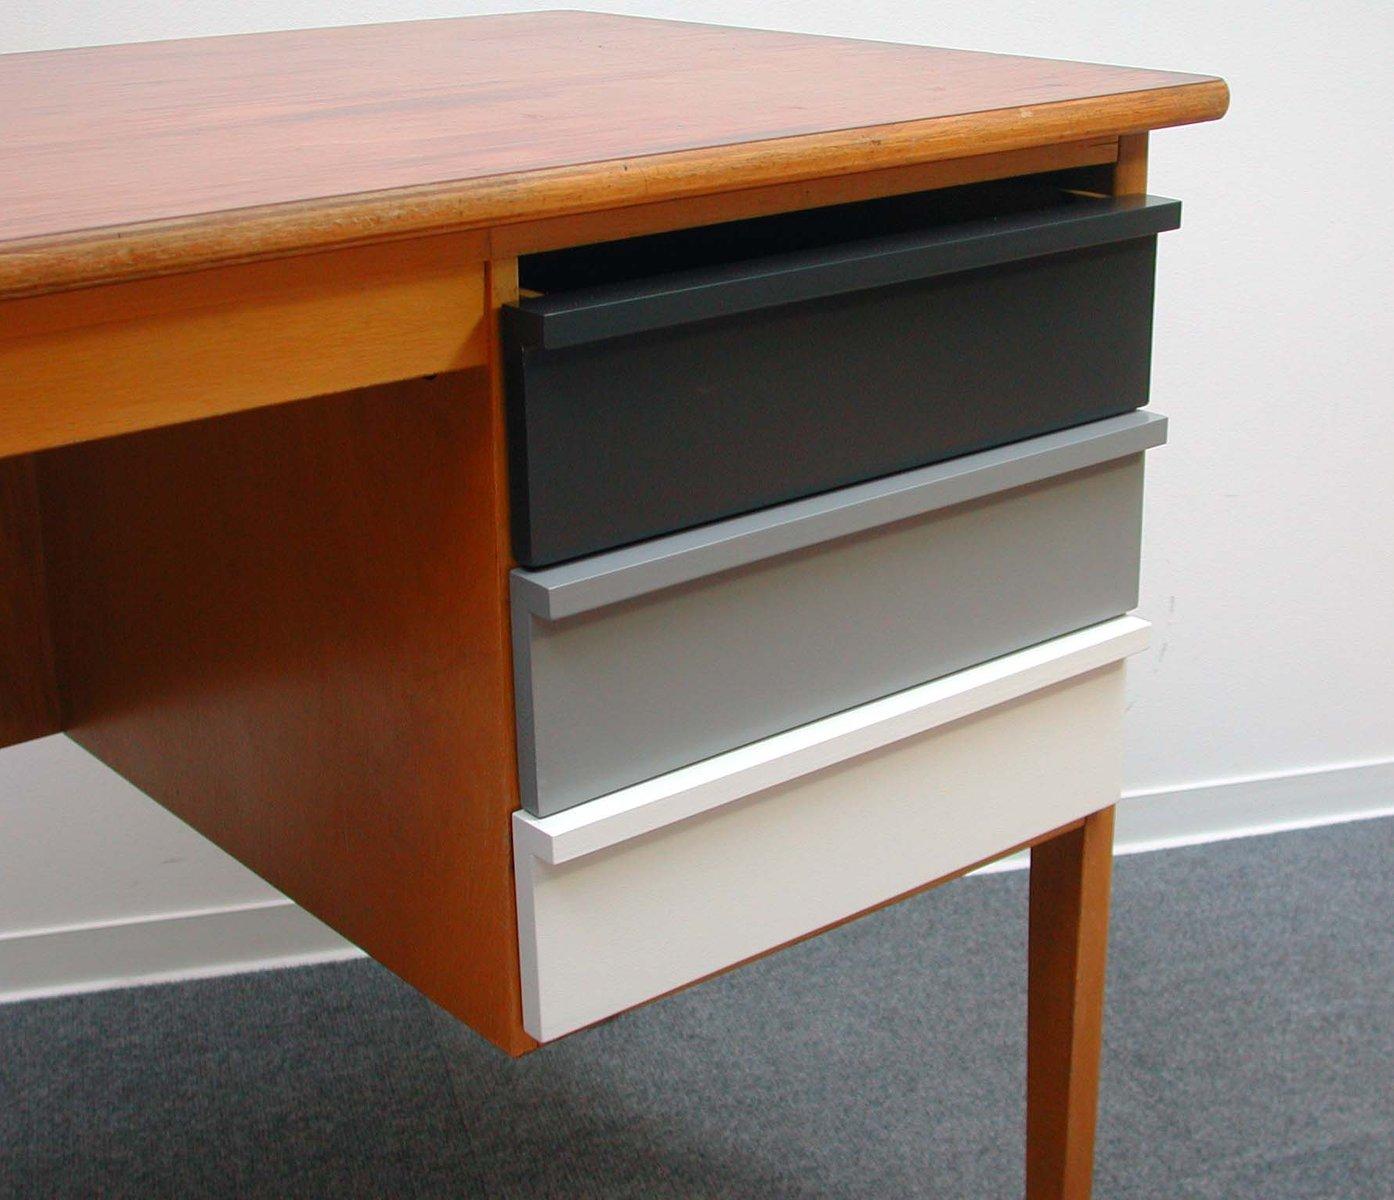 vintage lehrerpult aus holz 1960er bei pamono kaufen. Black Bedroom Furniture Sets. Home Design Ideas